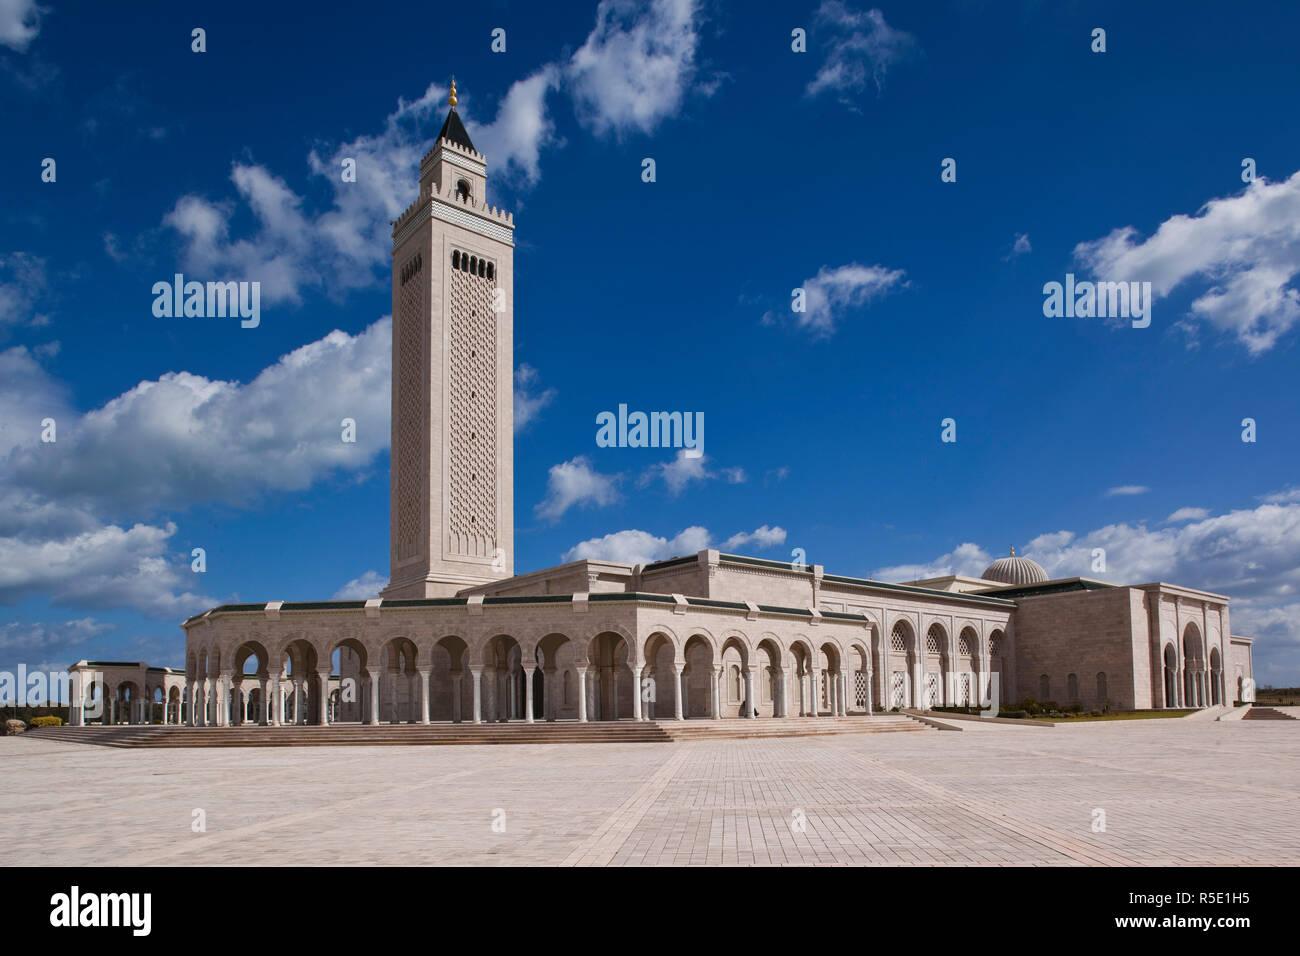 Tunisia, Tunis, Carthage, Mosque del Abedine - Stock Image